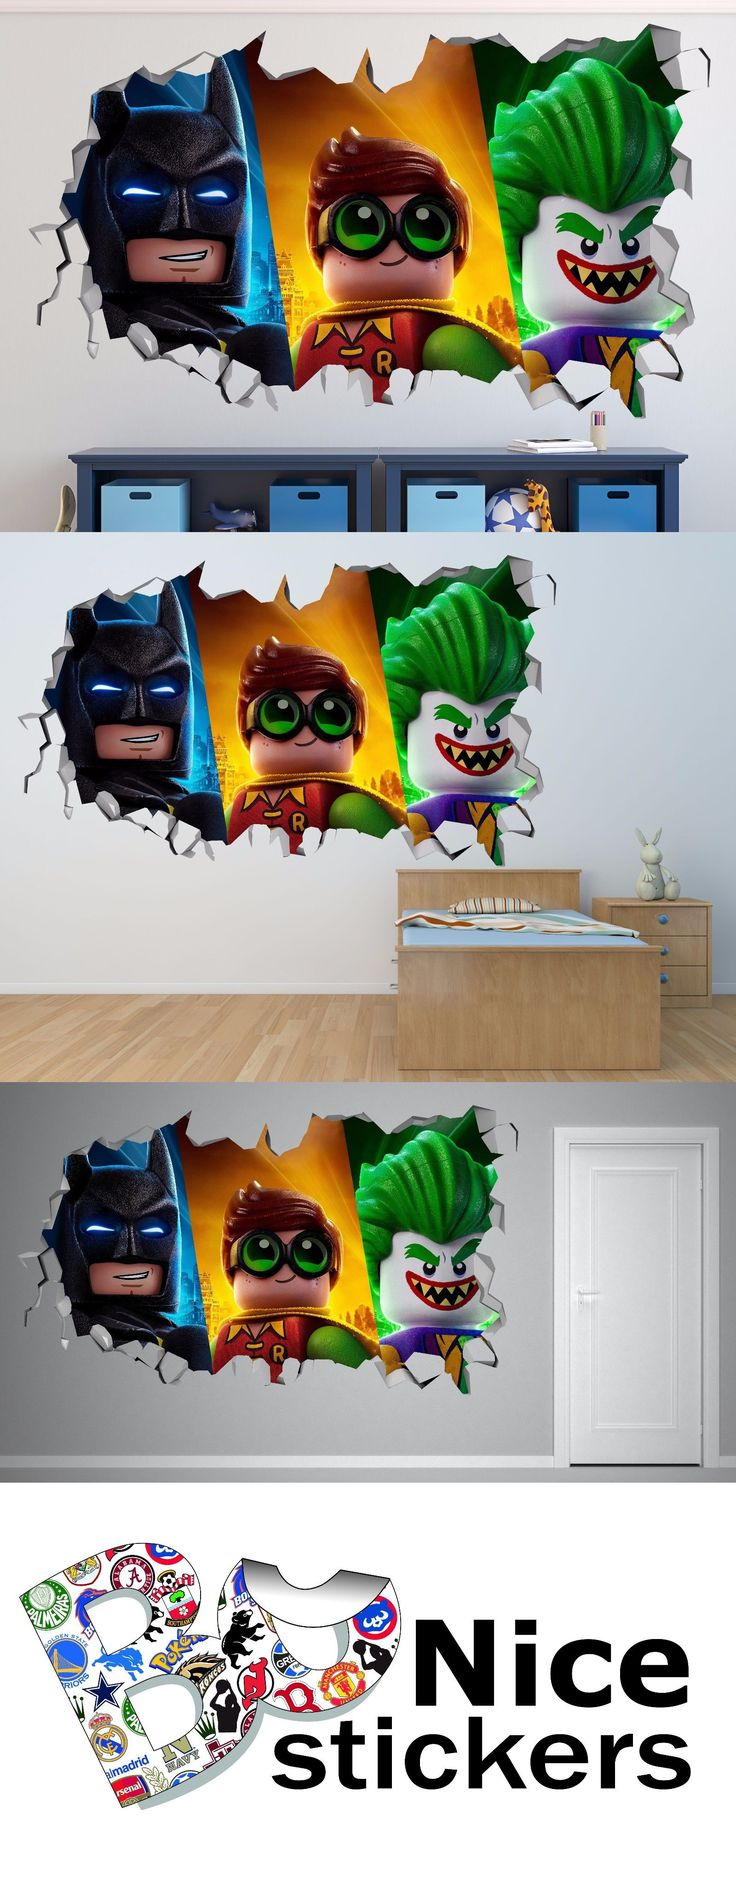 best 25 batman stickers ideas on pinterest personalized wall best 25 batman stickers ideas on pinterest personalized wall decals spiderman wall decals and gotham batman